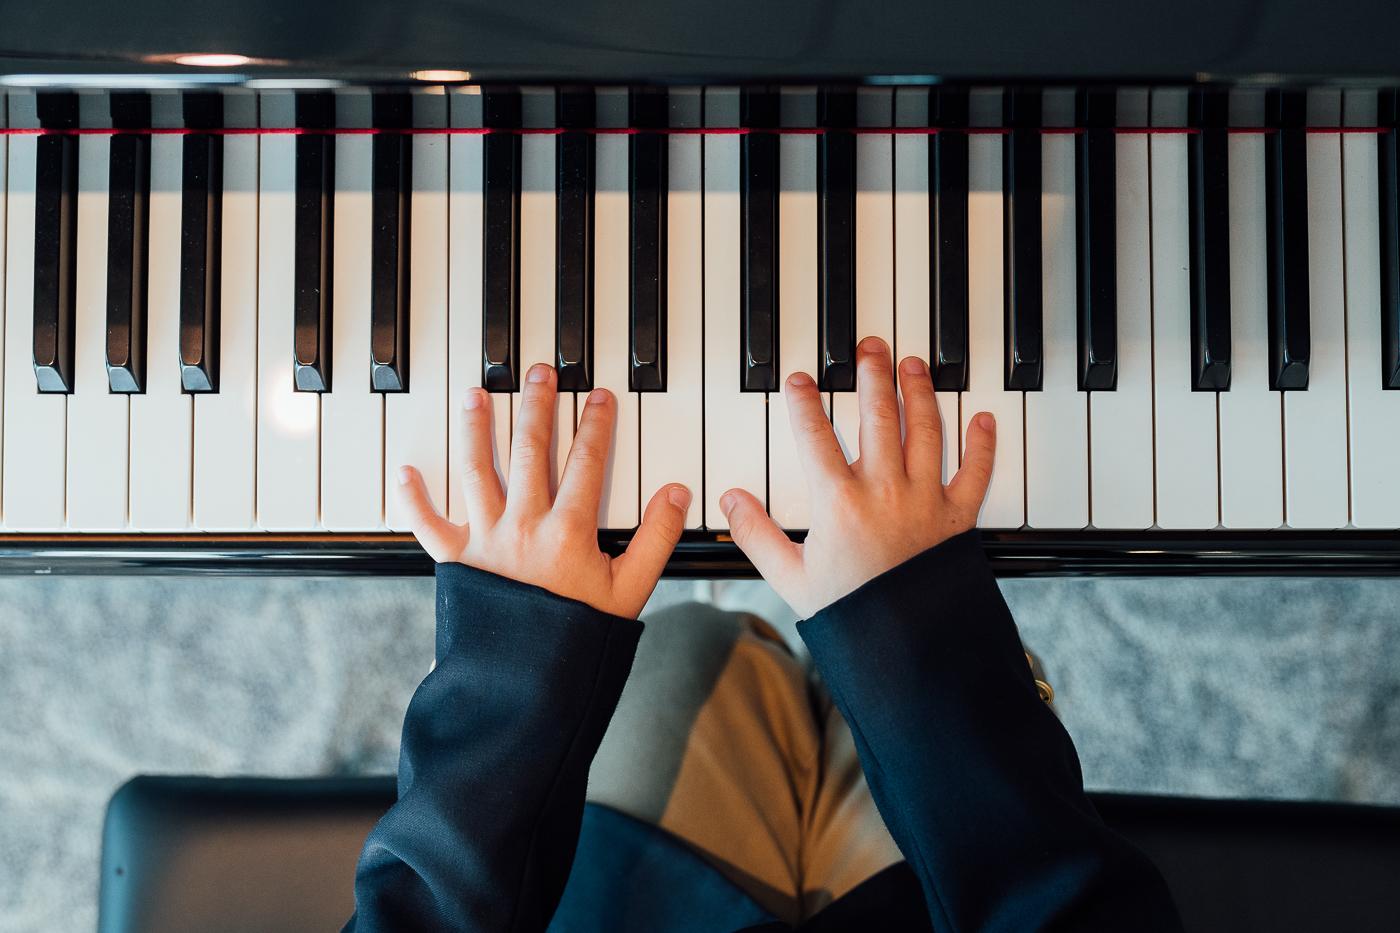 Piano Recital Resized for Web-71